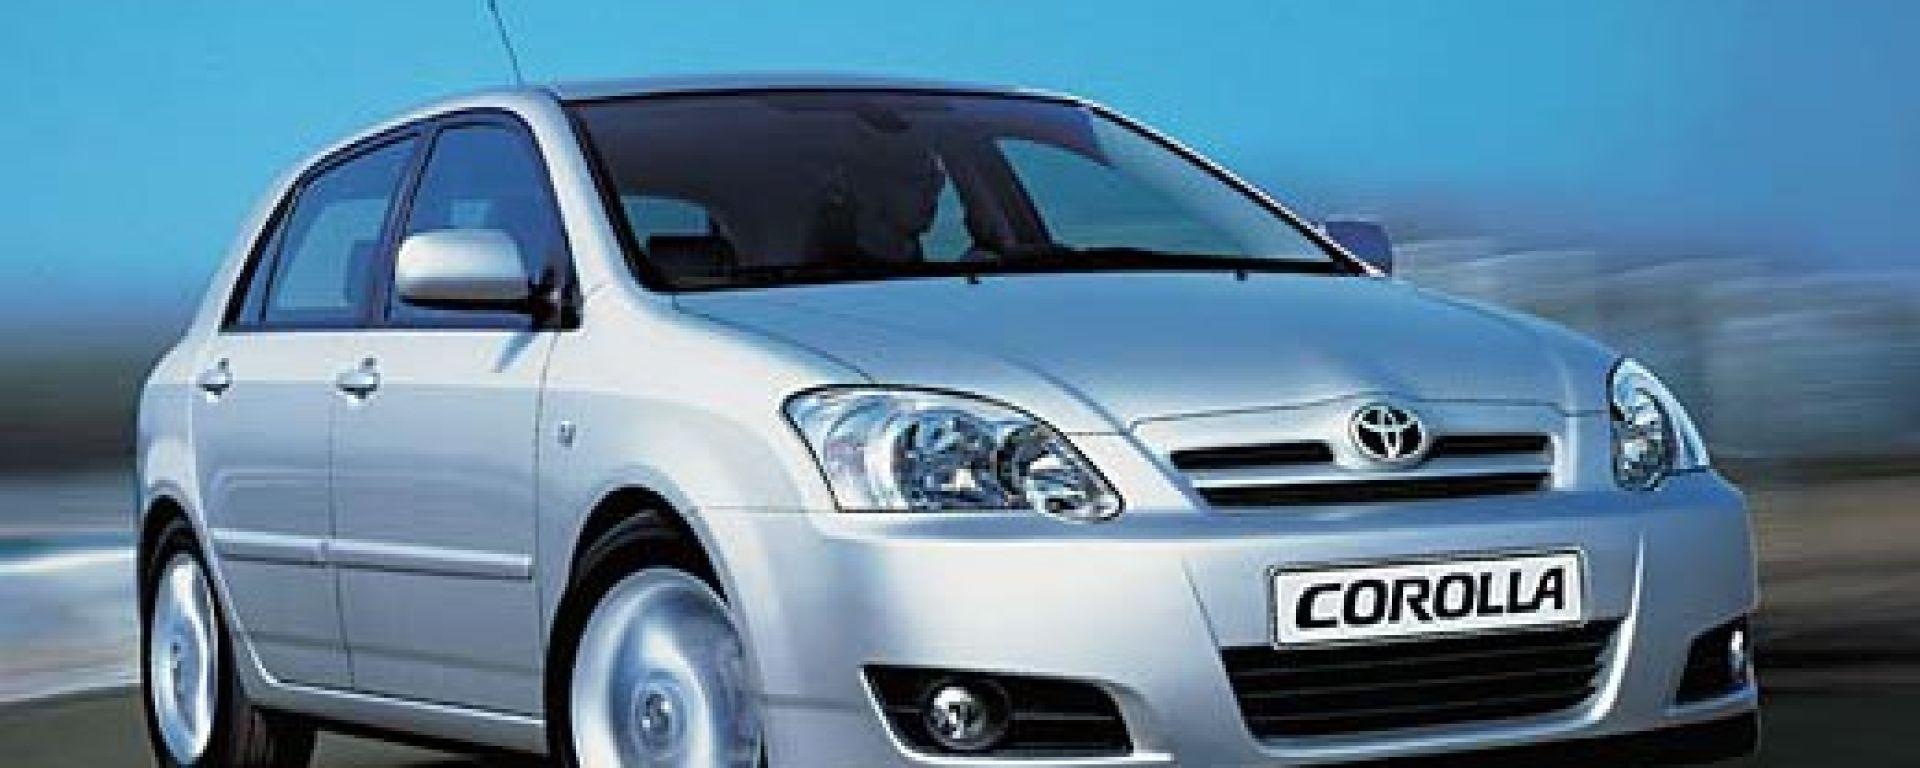 Anteprima: Toyota Corolla 2004